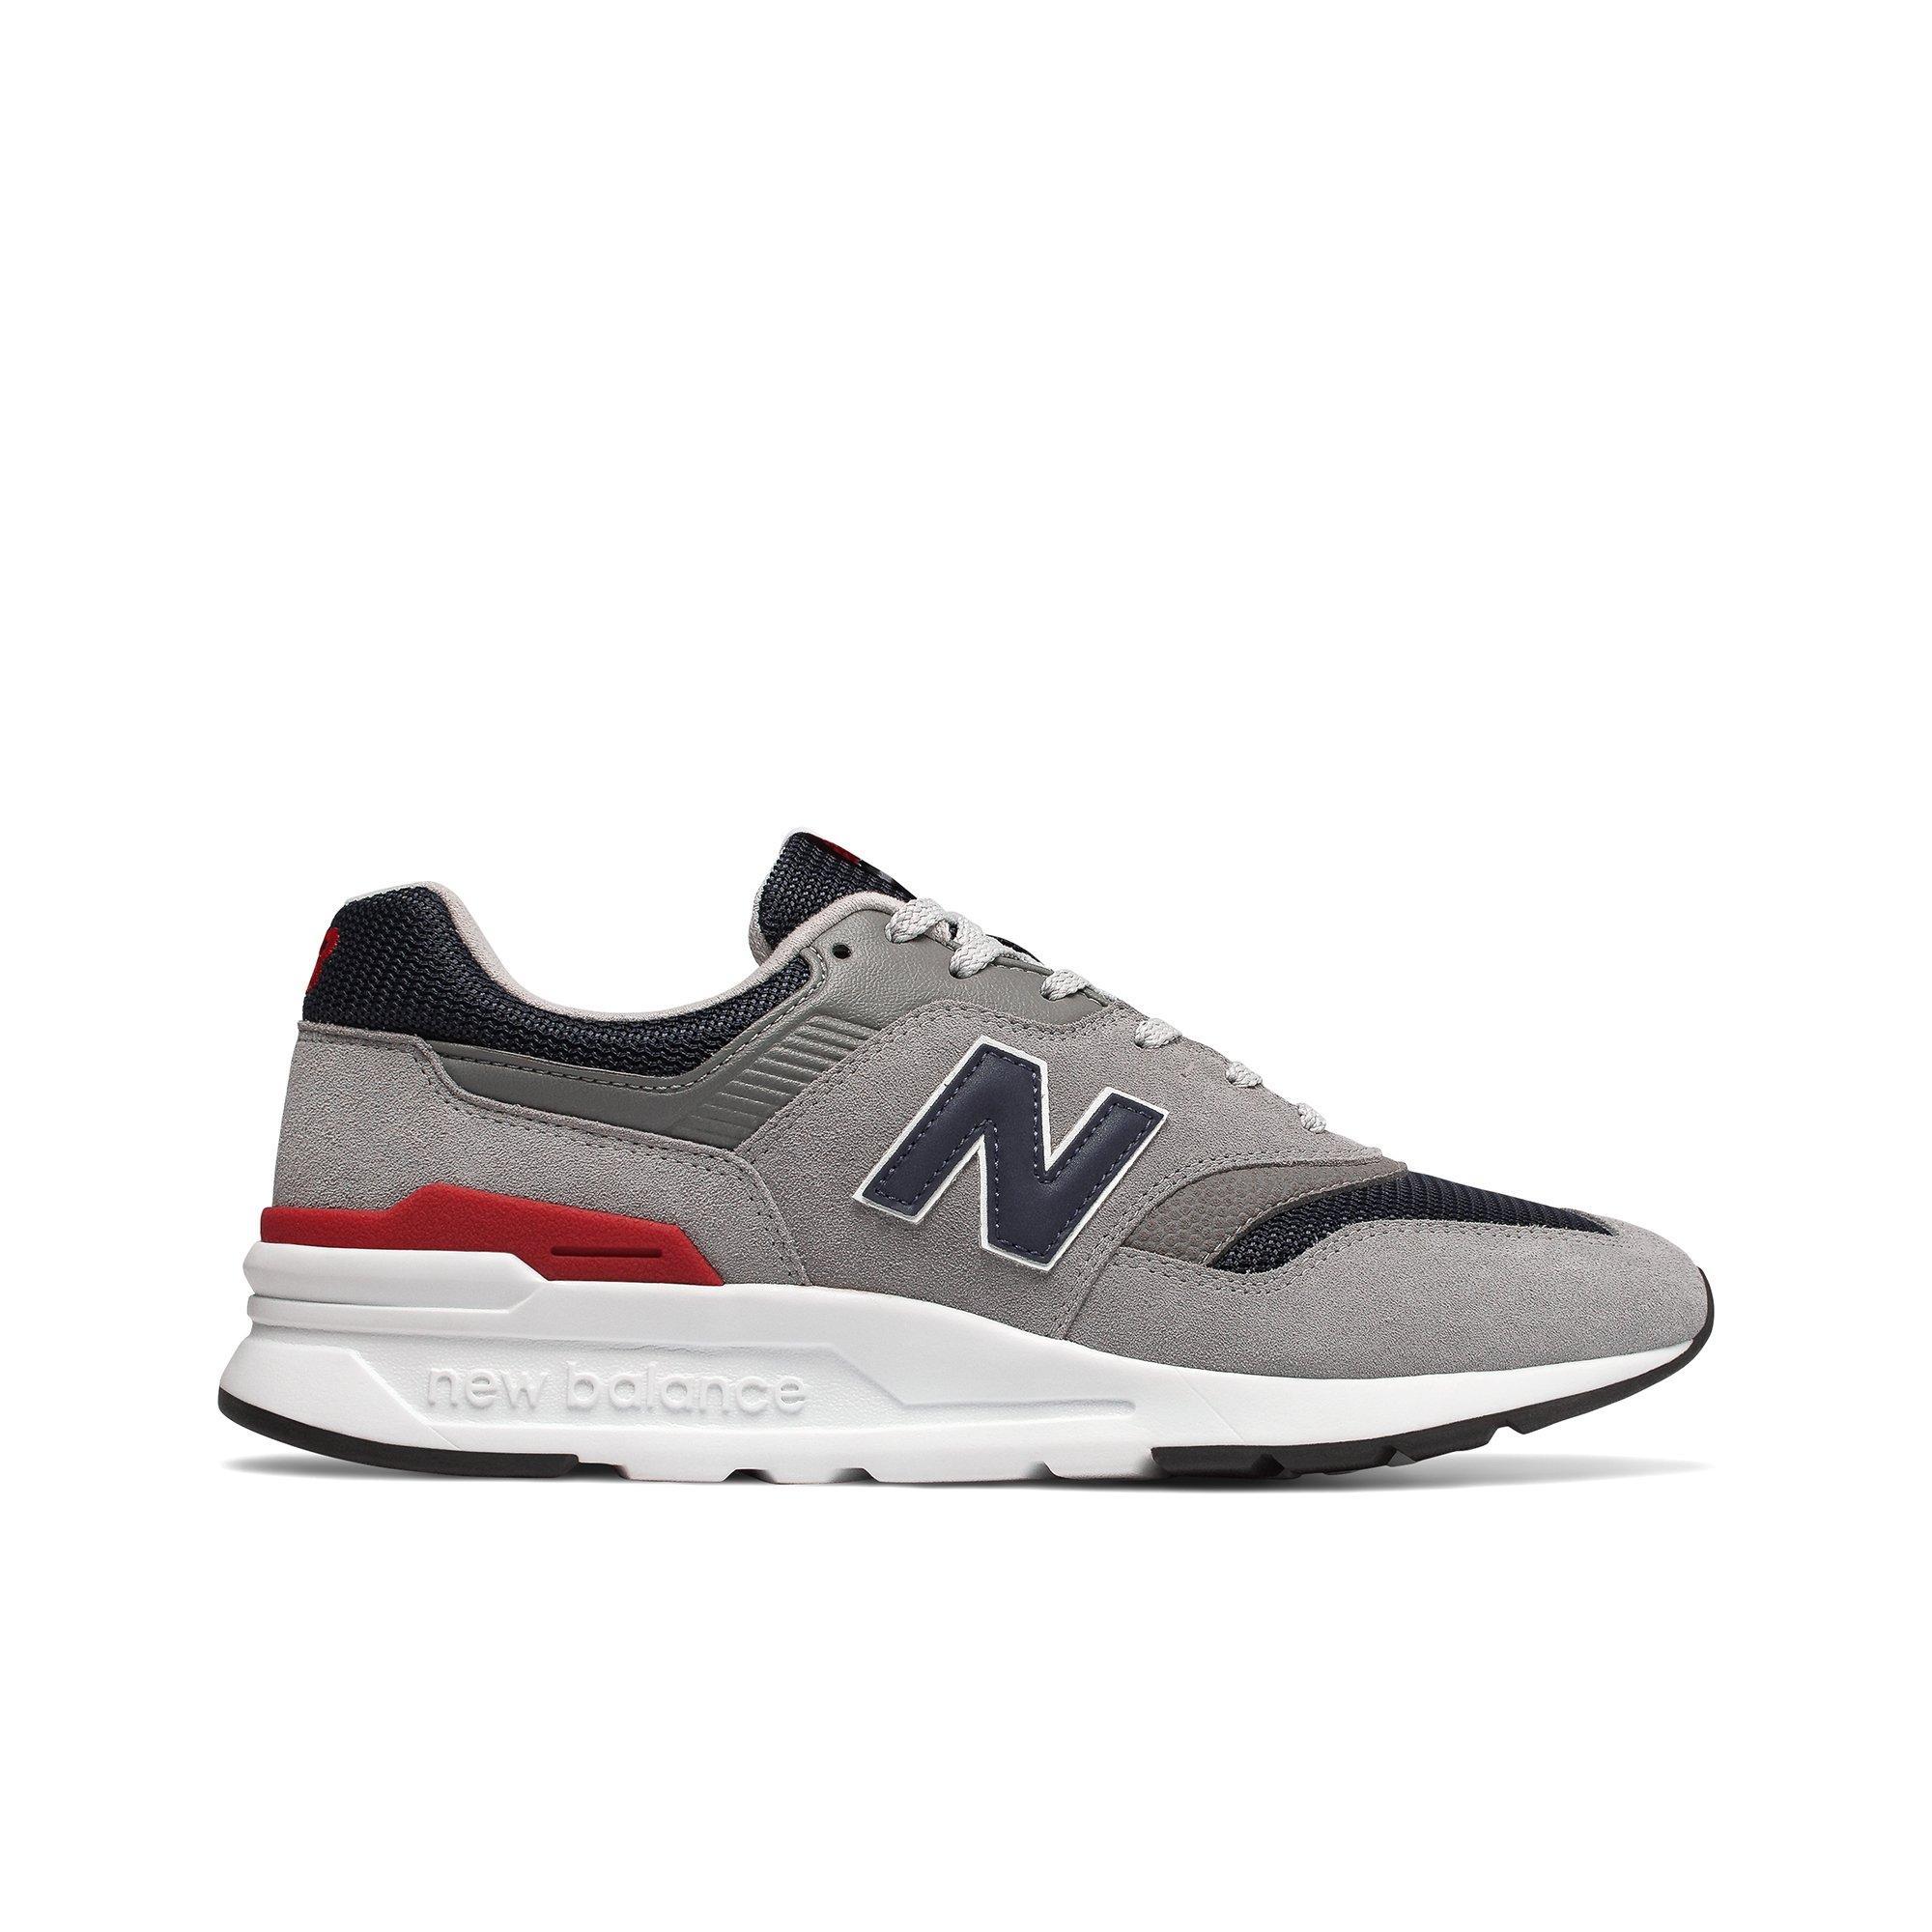 new balance 997h navy